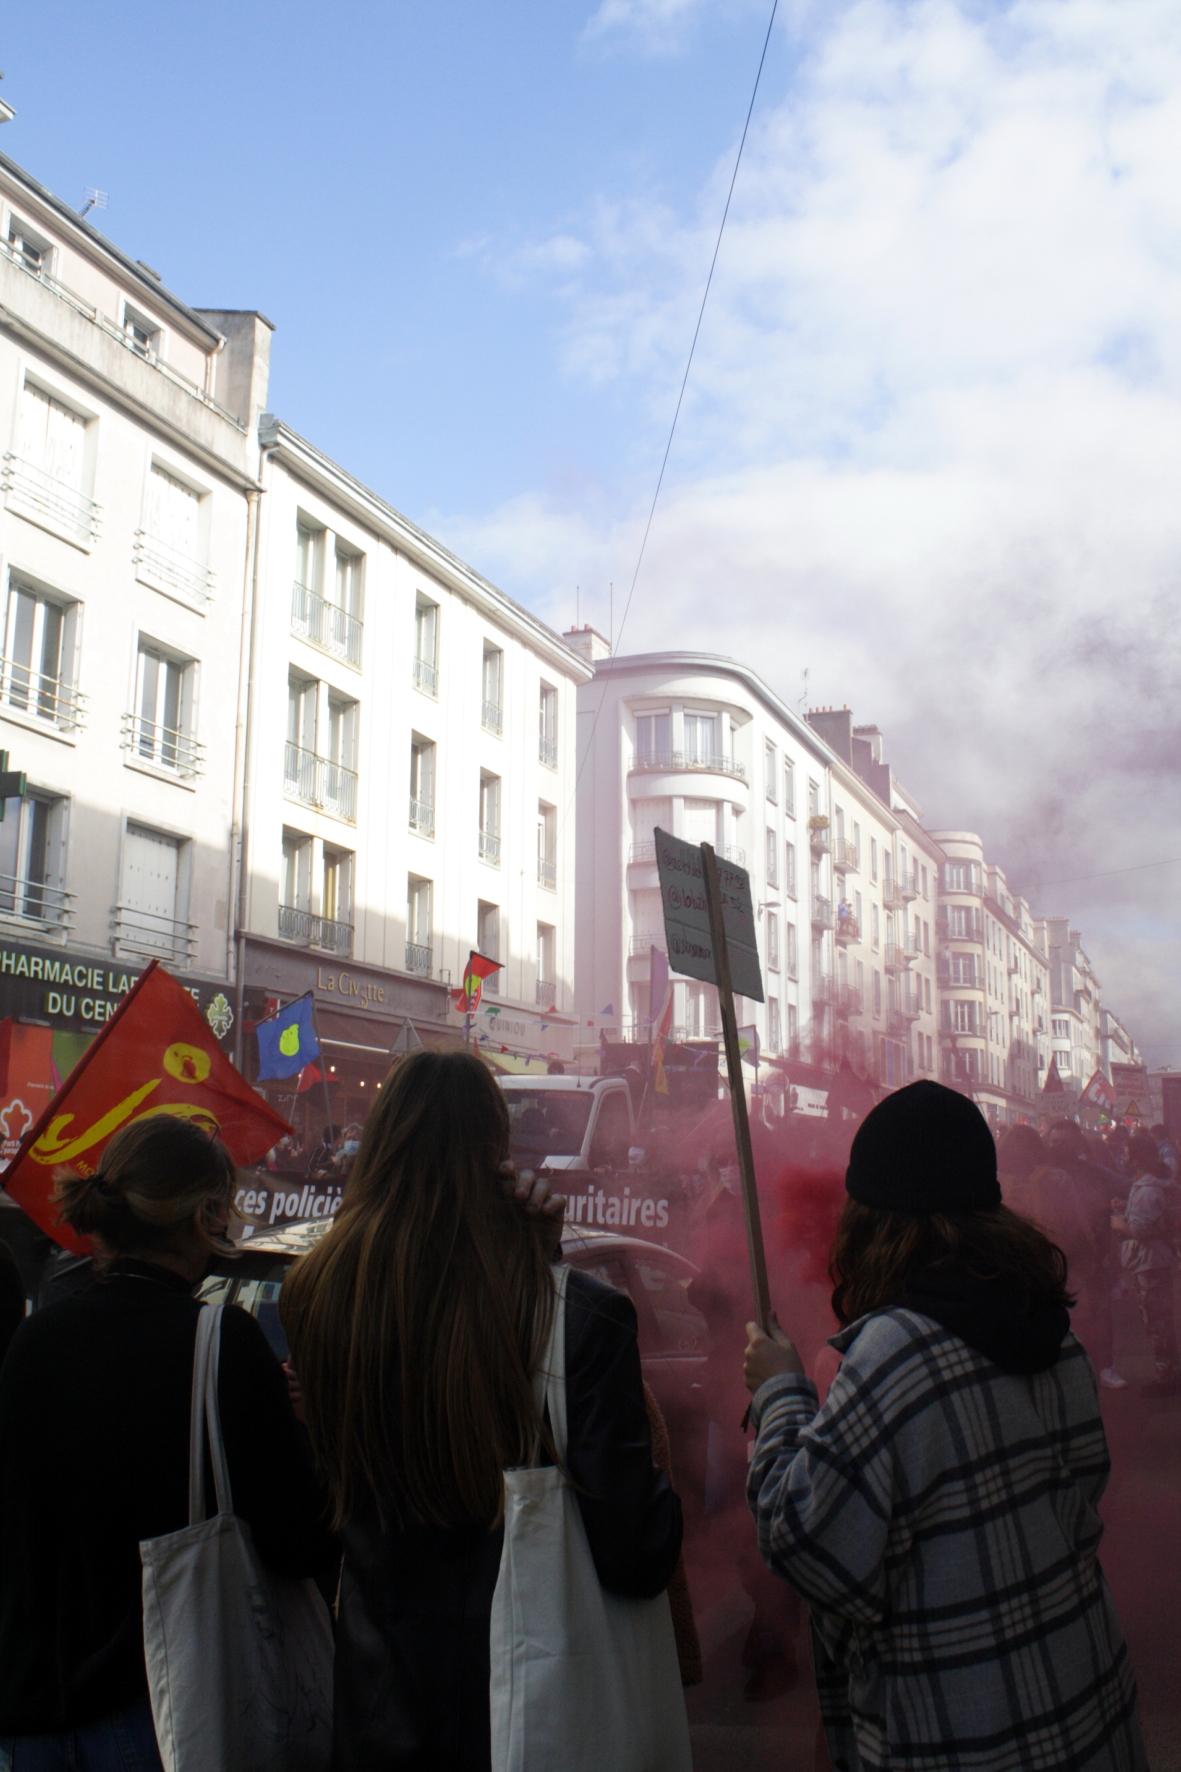 Manif-culture-Brest-20-03-21-188